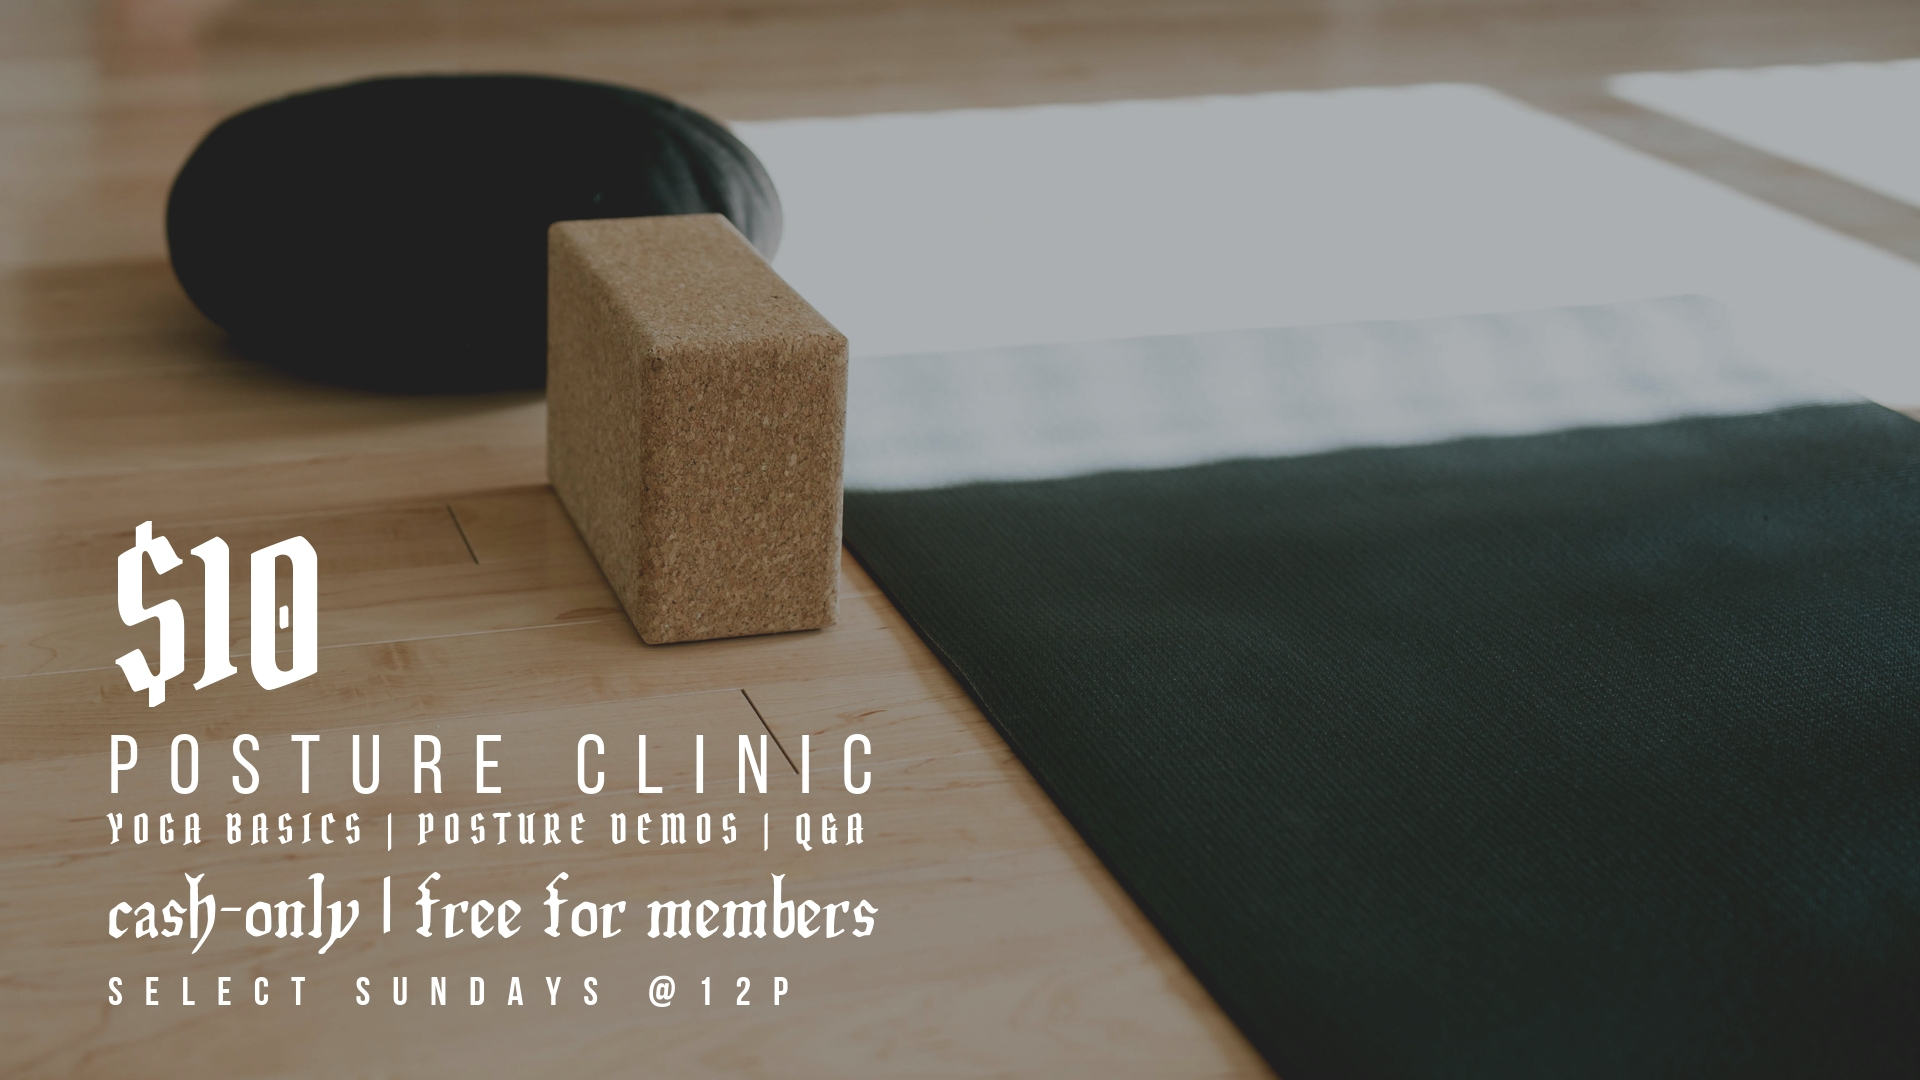 posture-clinic-graphic-EDIT.jpg